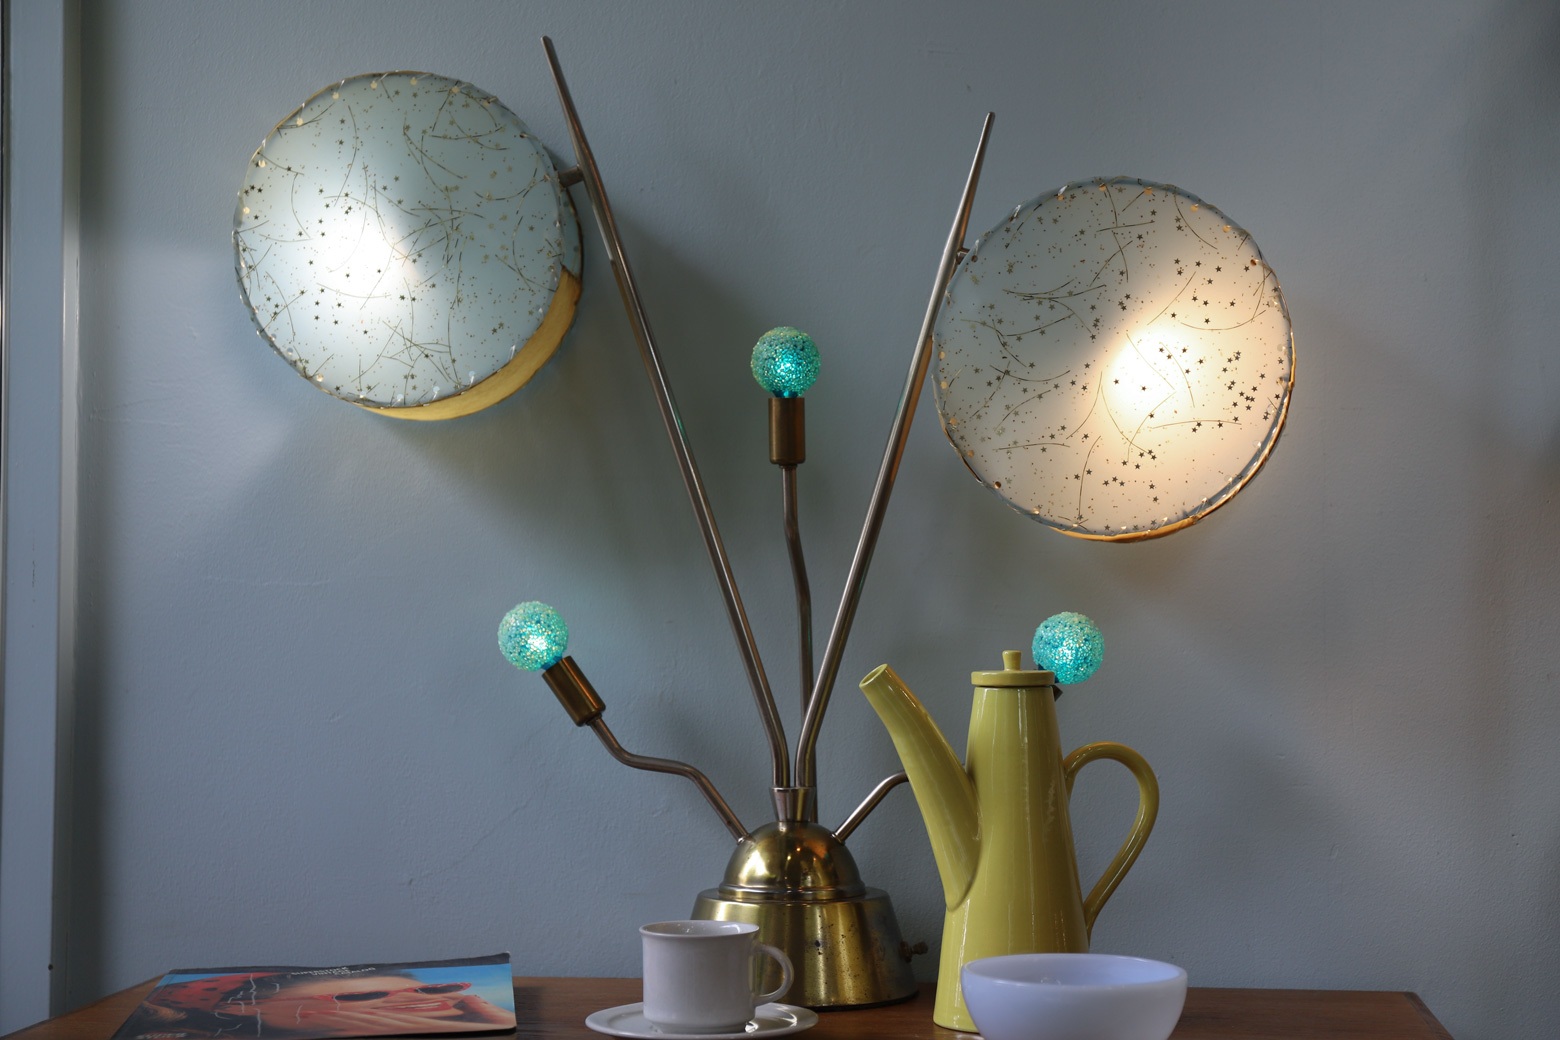 US Vintage Atomic Table Lamp Mid-Century Space Age/アメリカ ヴィンテージ アトミック テーブルランプ 照明 スペースエイジ ミッドセンチュリ